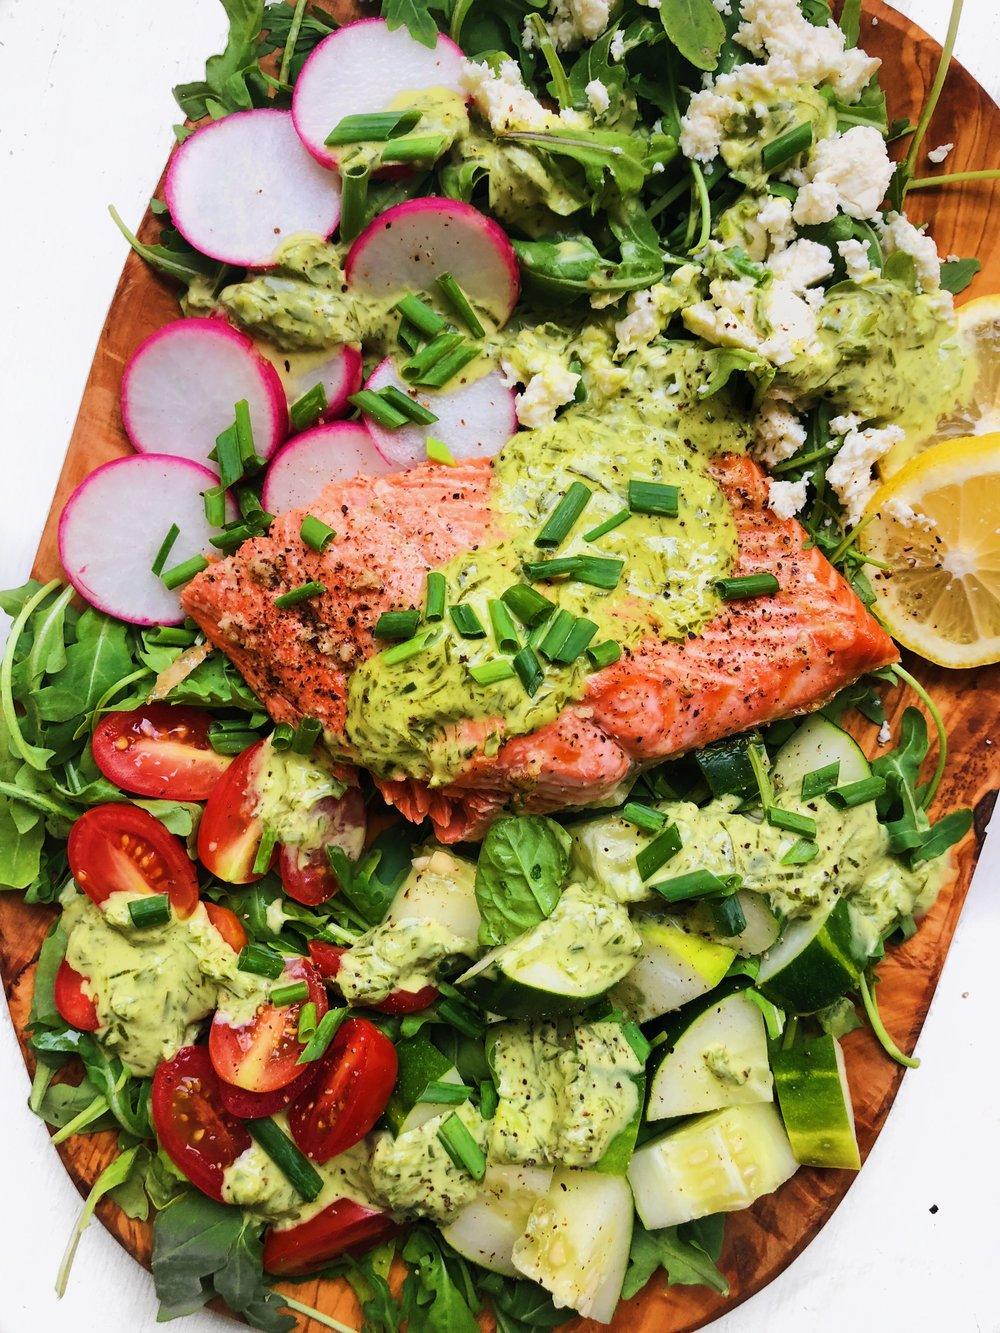 Salmon Salad with Creamy Lemon-Chive Vinaigrette